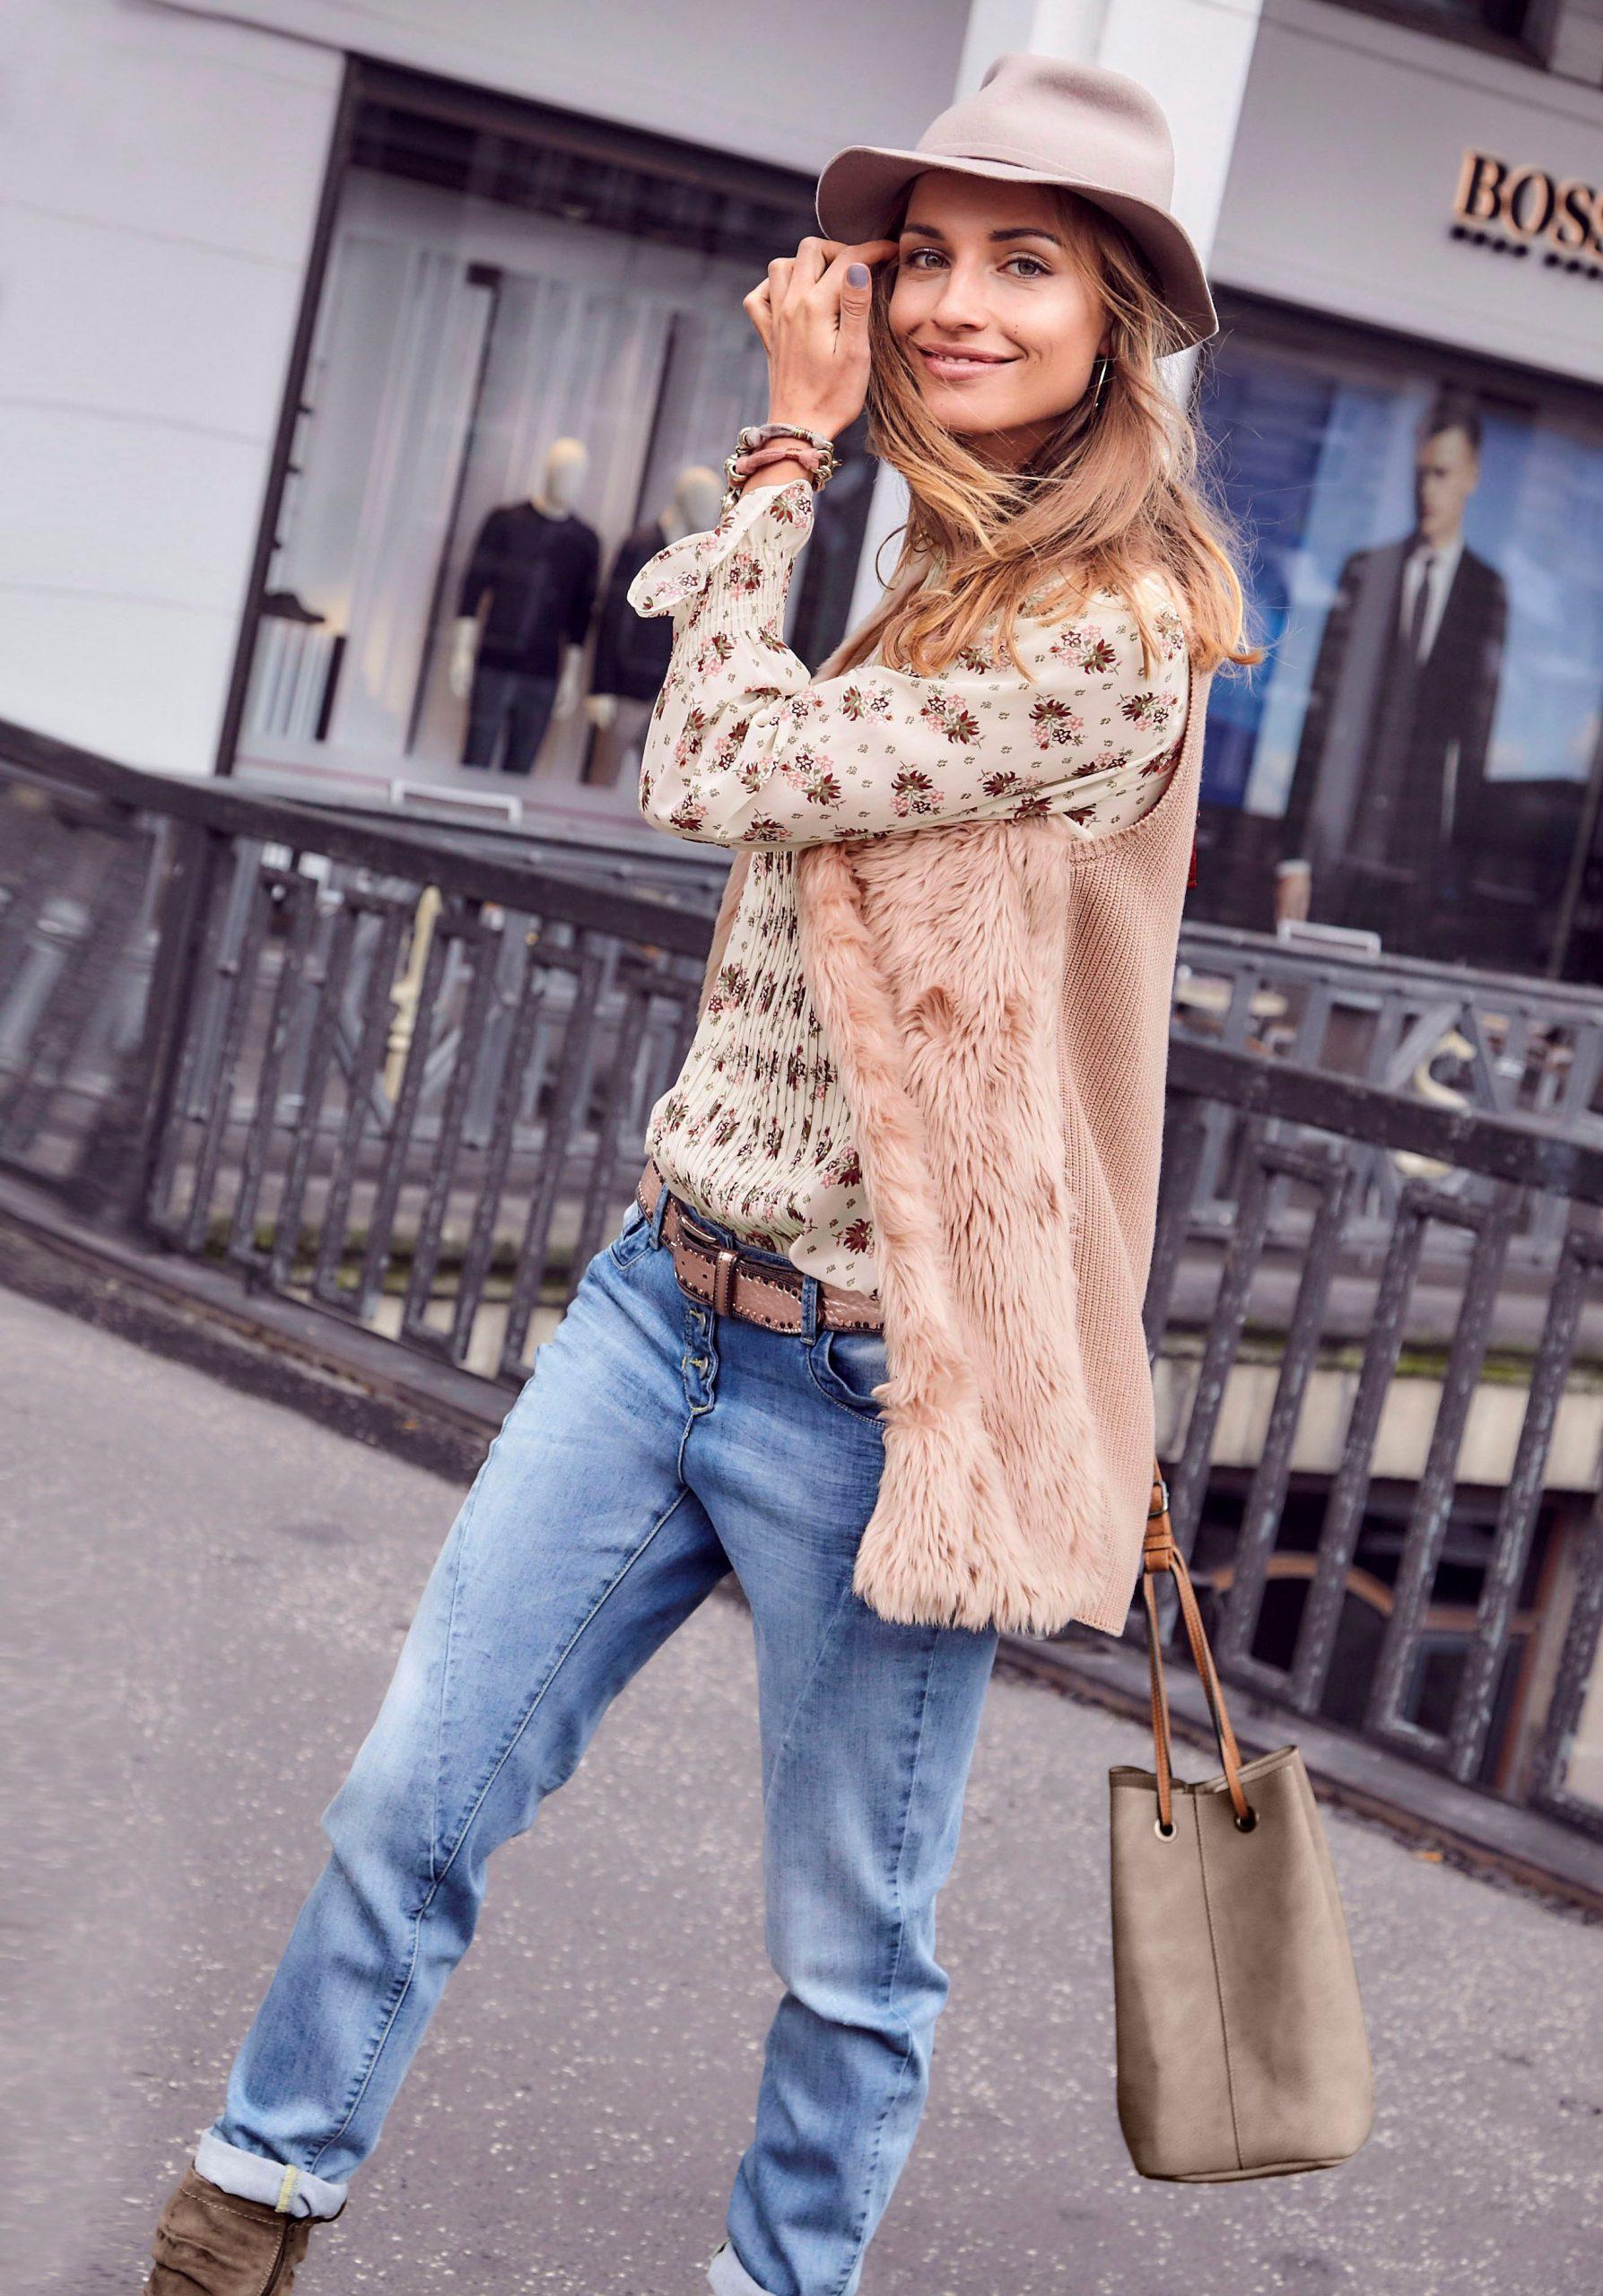 Aniston Longweste Aniston Baur Damenmode Outfit Mode